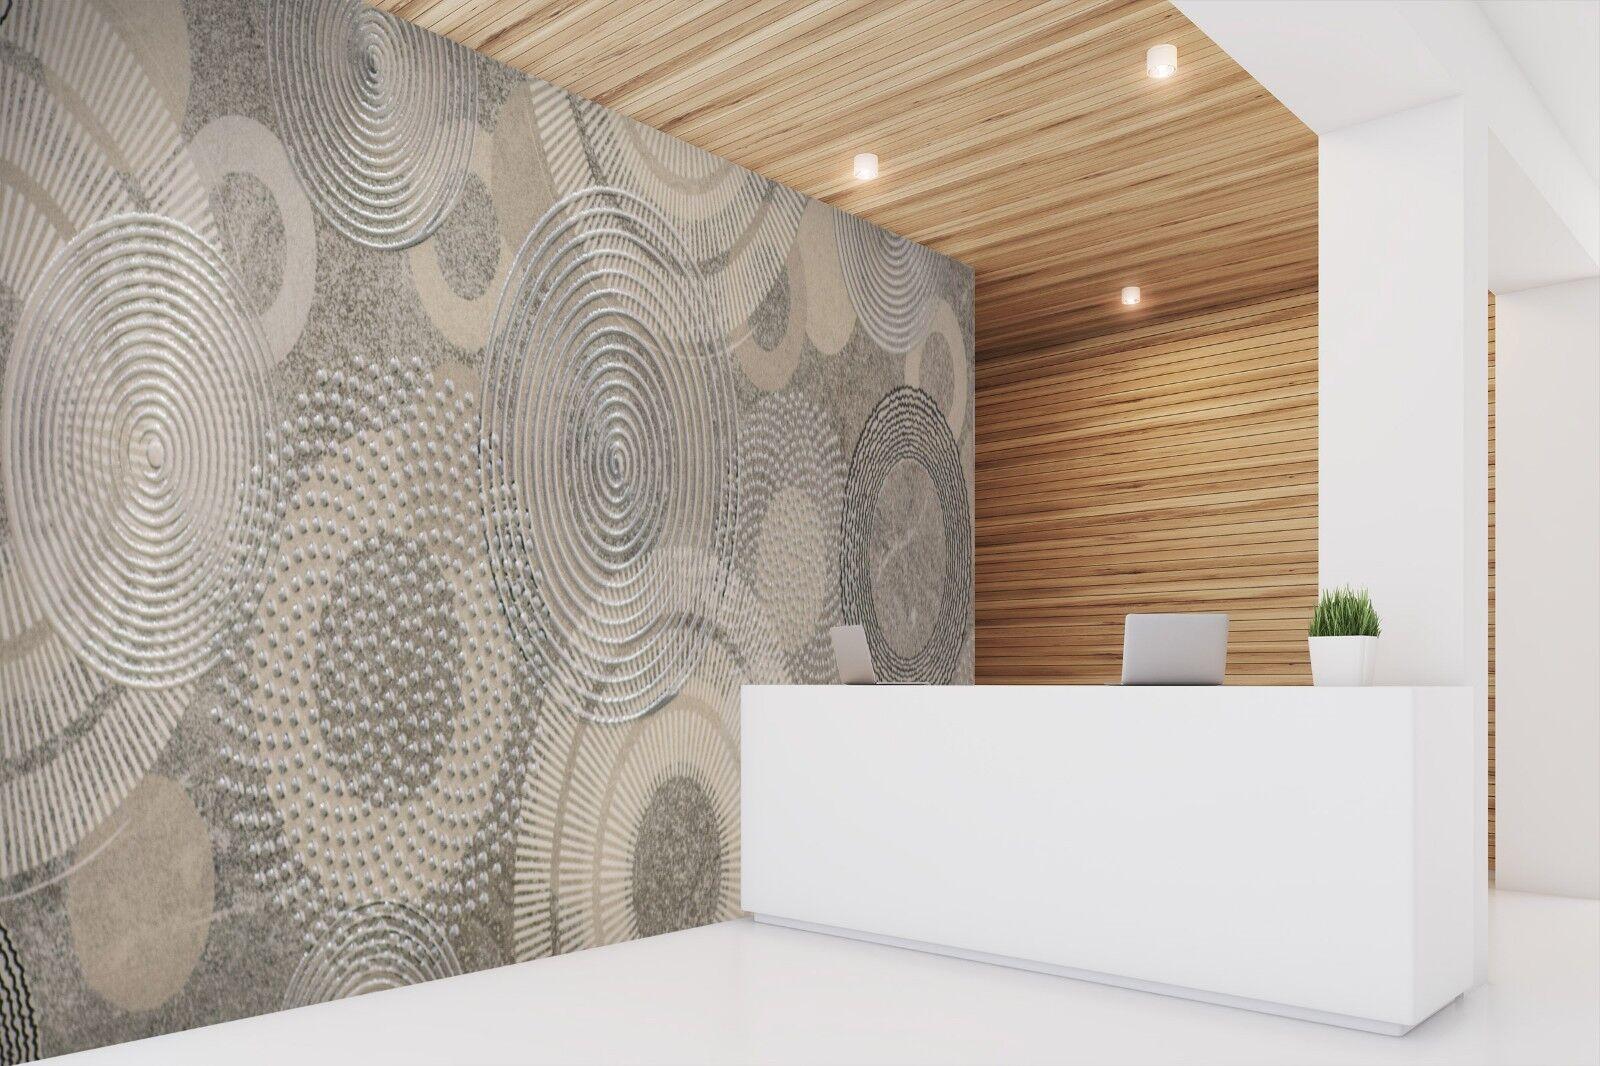 3D Kreis Muster 765 Textur Fliesen Marmor Tapeten Abziehbild Tapete Wandbild